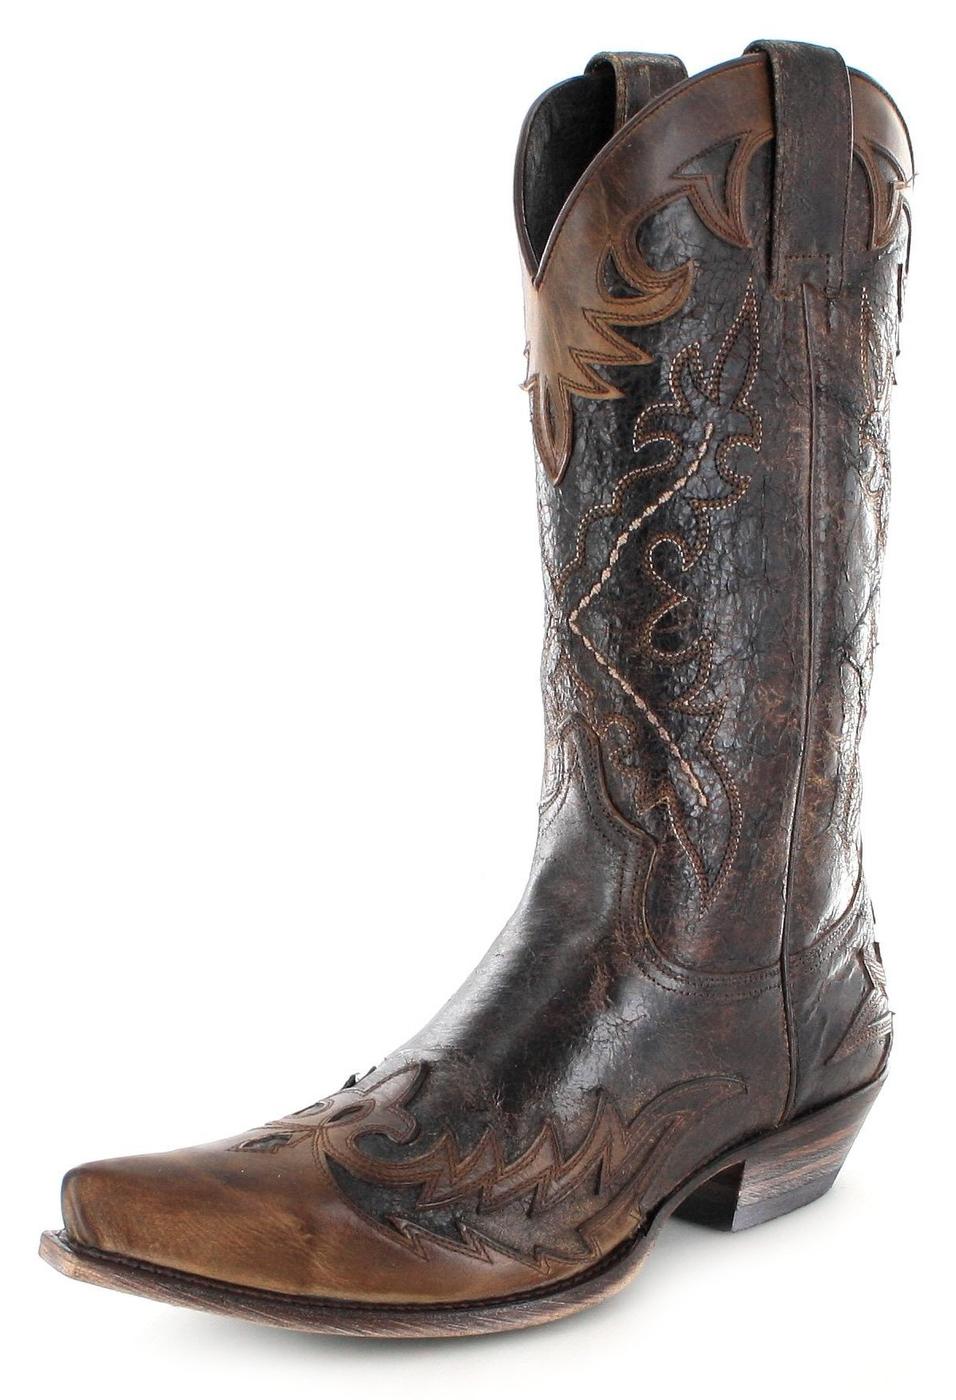 Sendra Boots 9669 Tang Marron Quercia Westernstiefel - braun